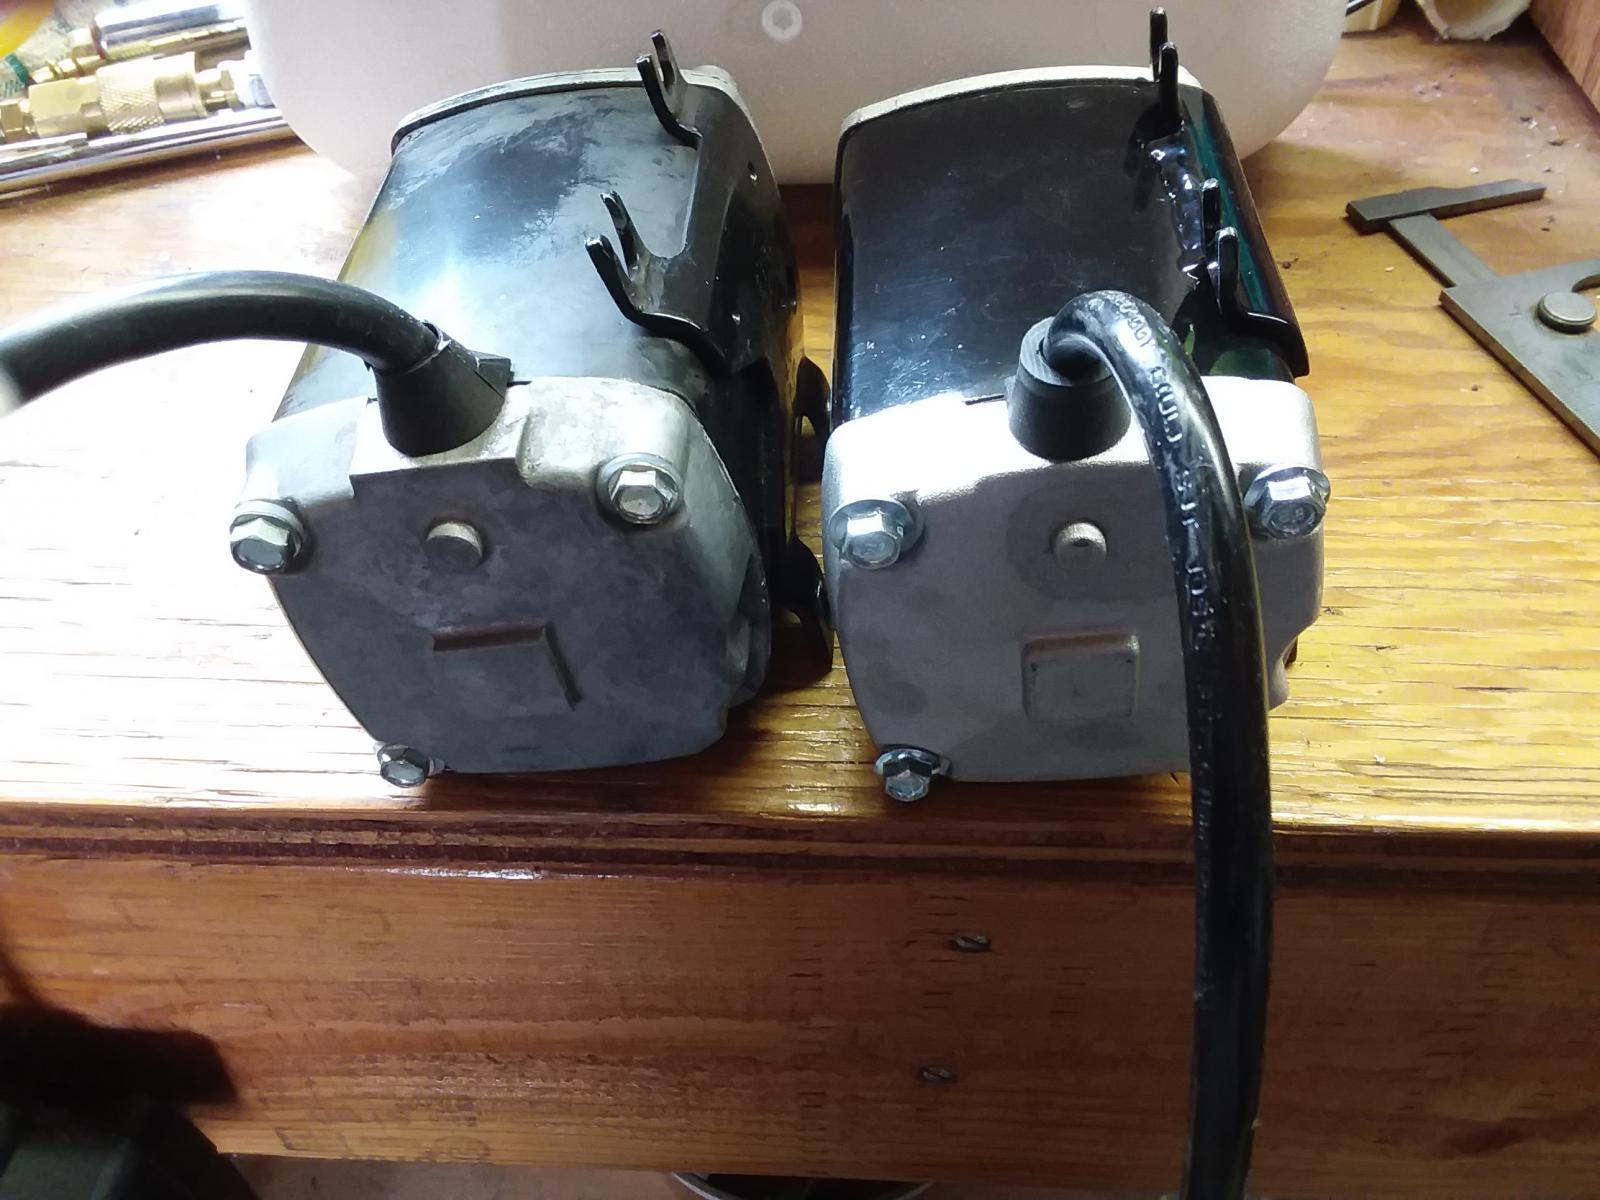 Electric start on Tecumseh HMSK 80-110 not engaging - Snowblower